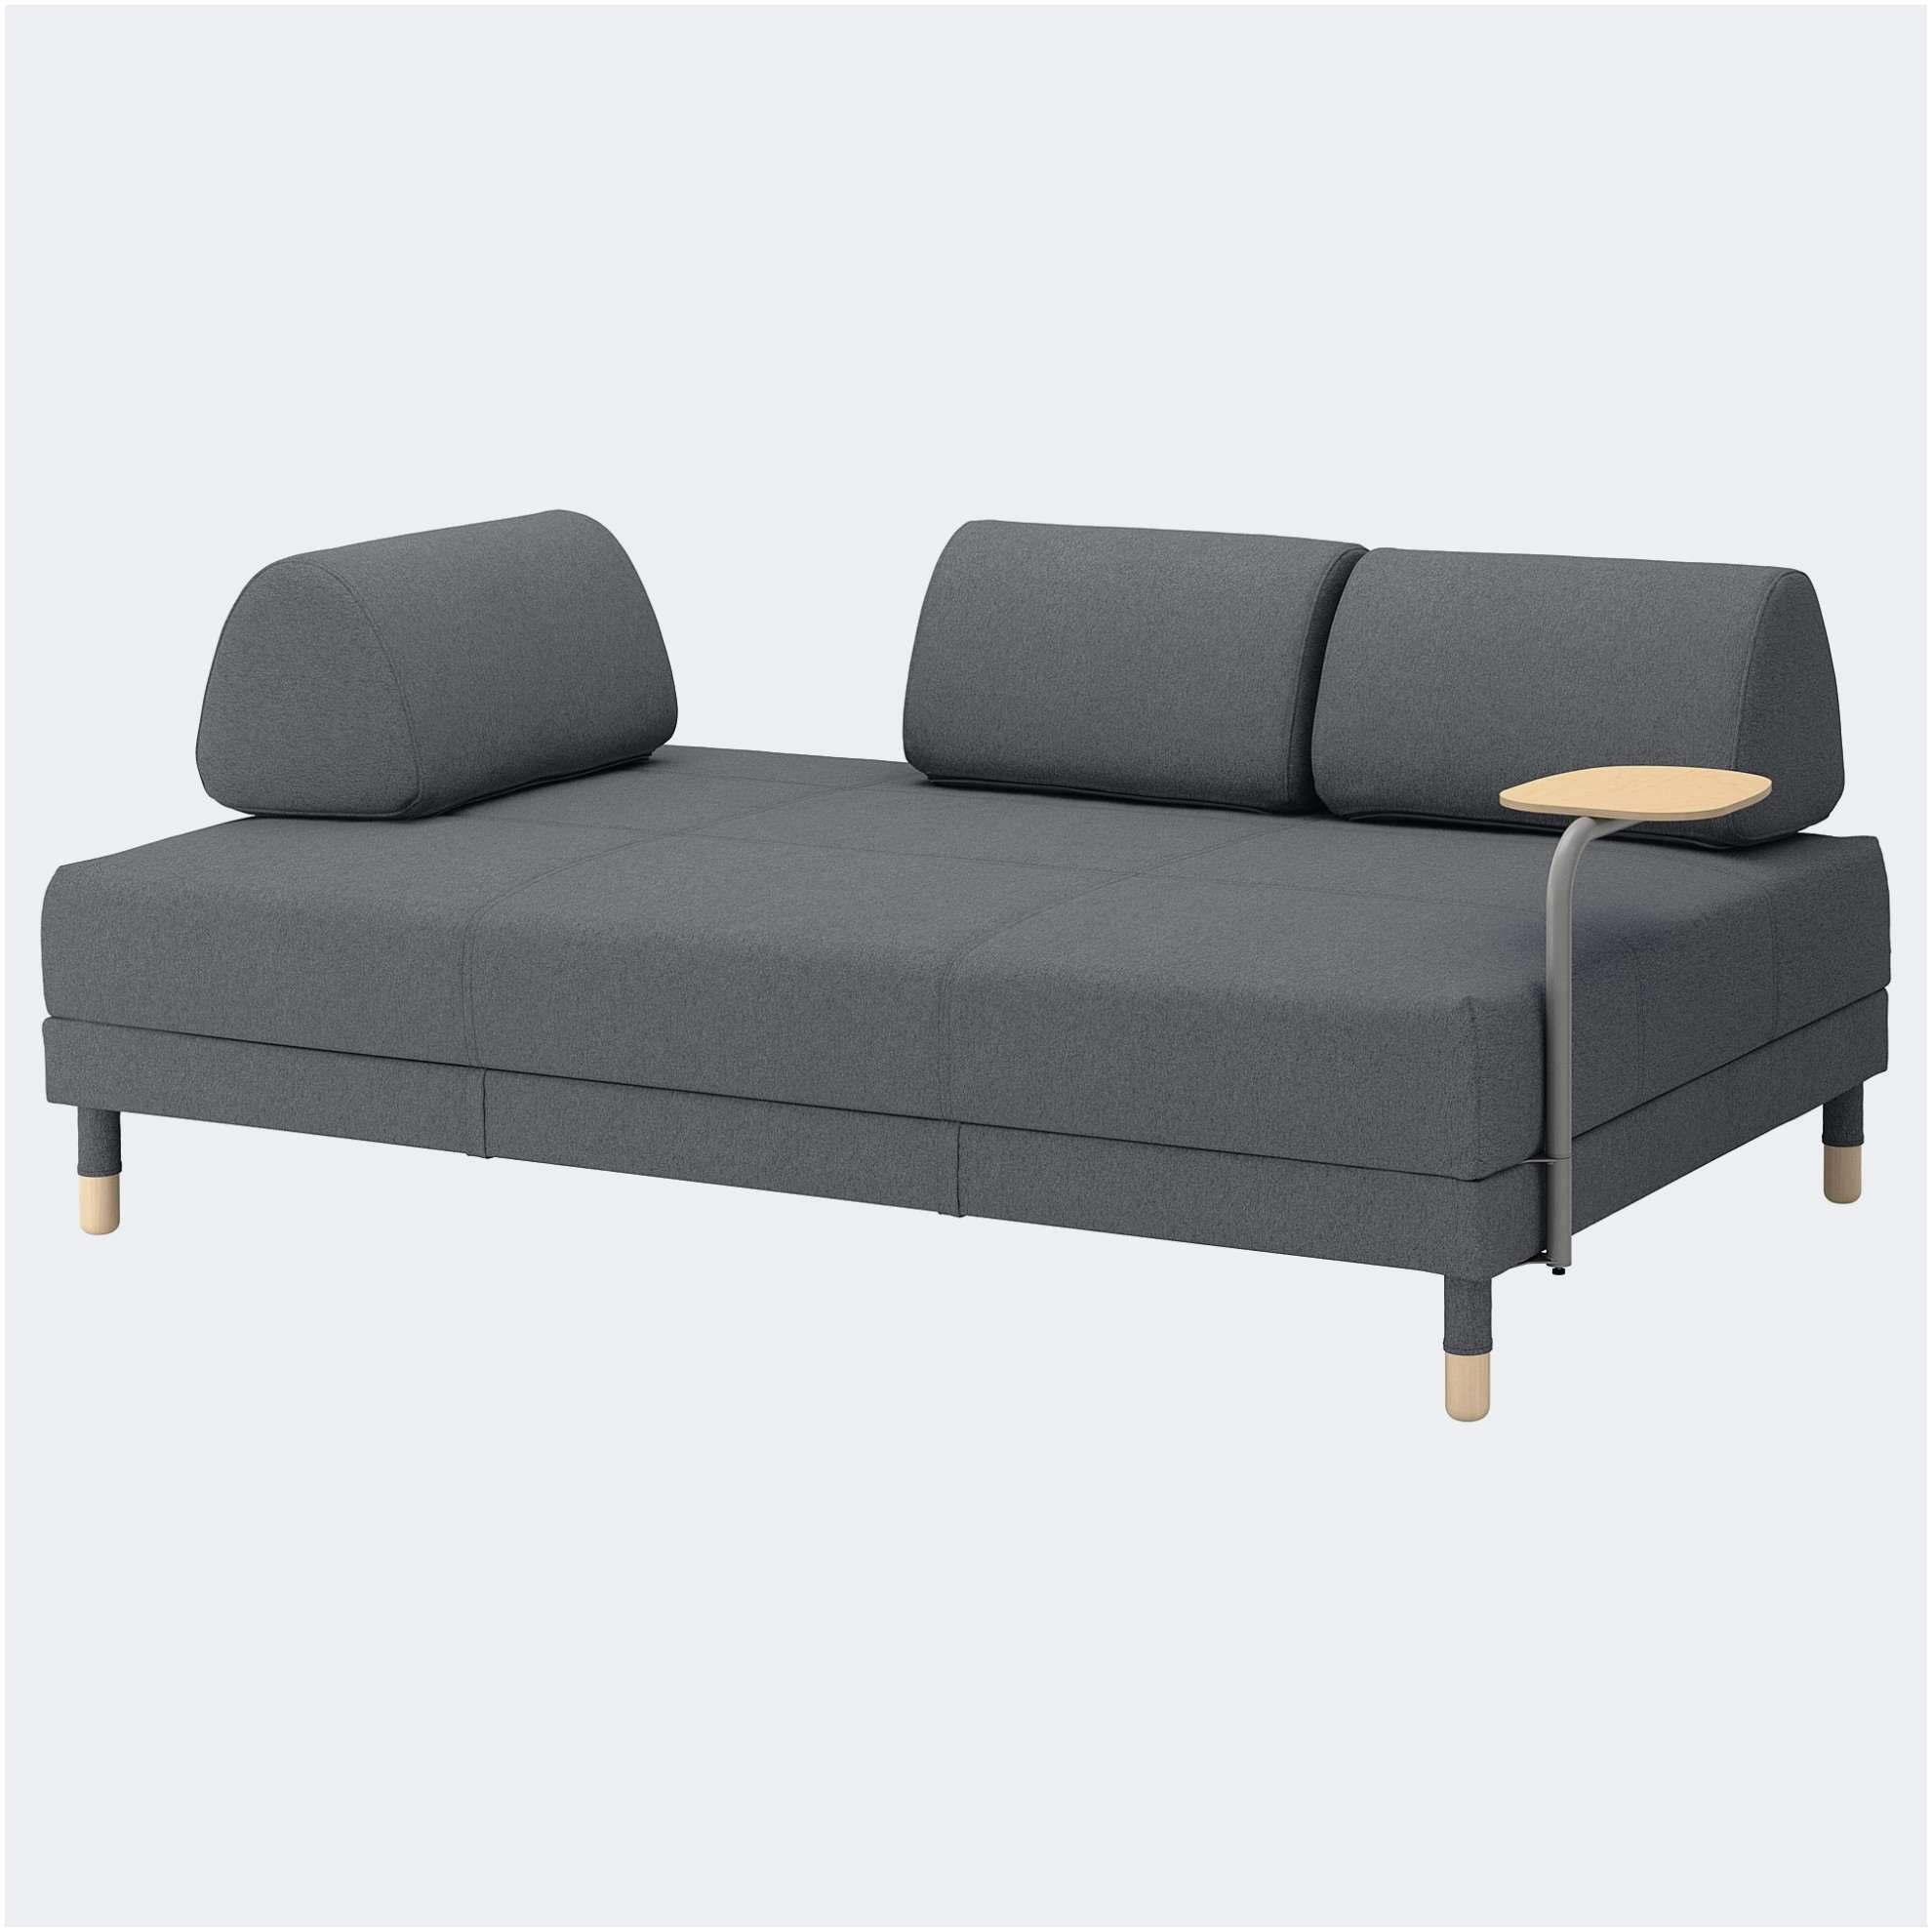 Canapé Lit Gigogne Adulte Beau 60 Canapé Lit Gigogne Ikea Vue Jongor4hire